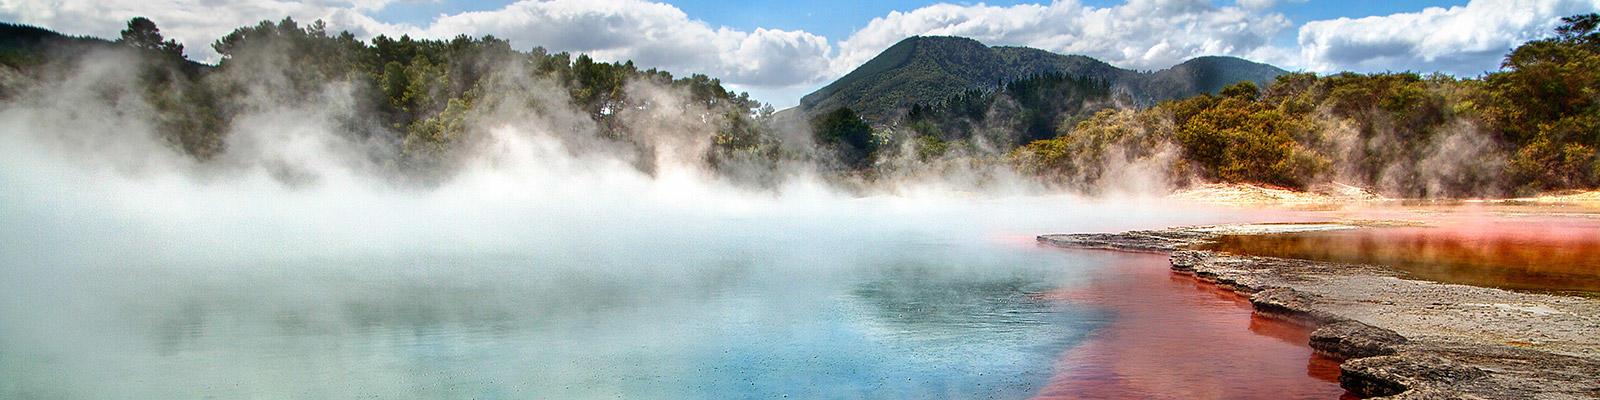 Rotorua thermal springs new zealand